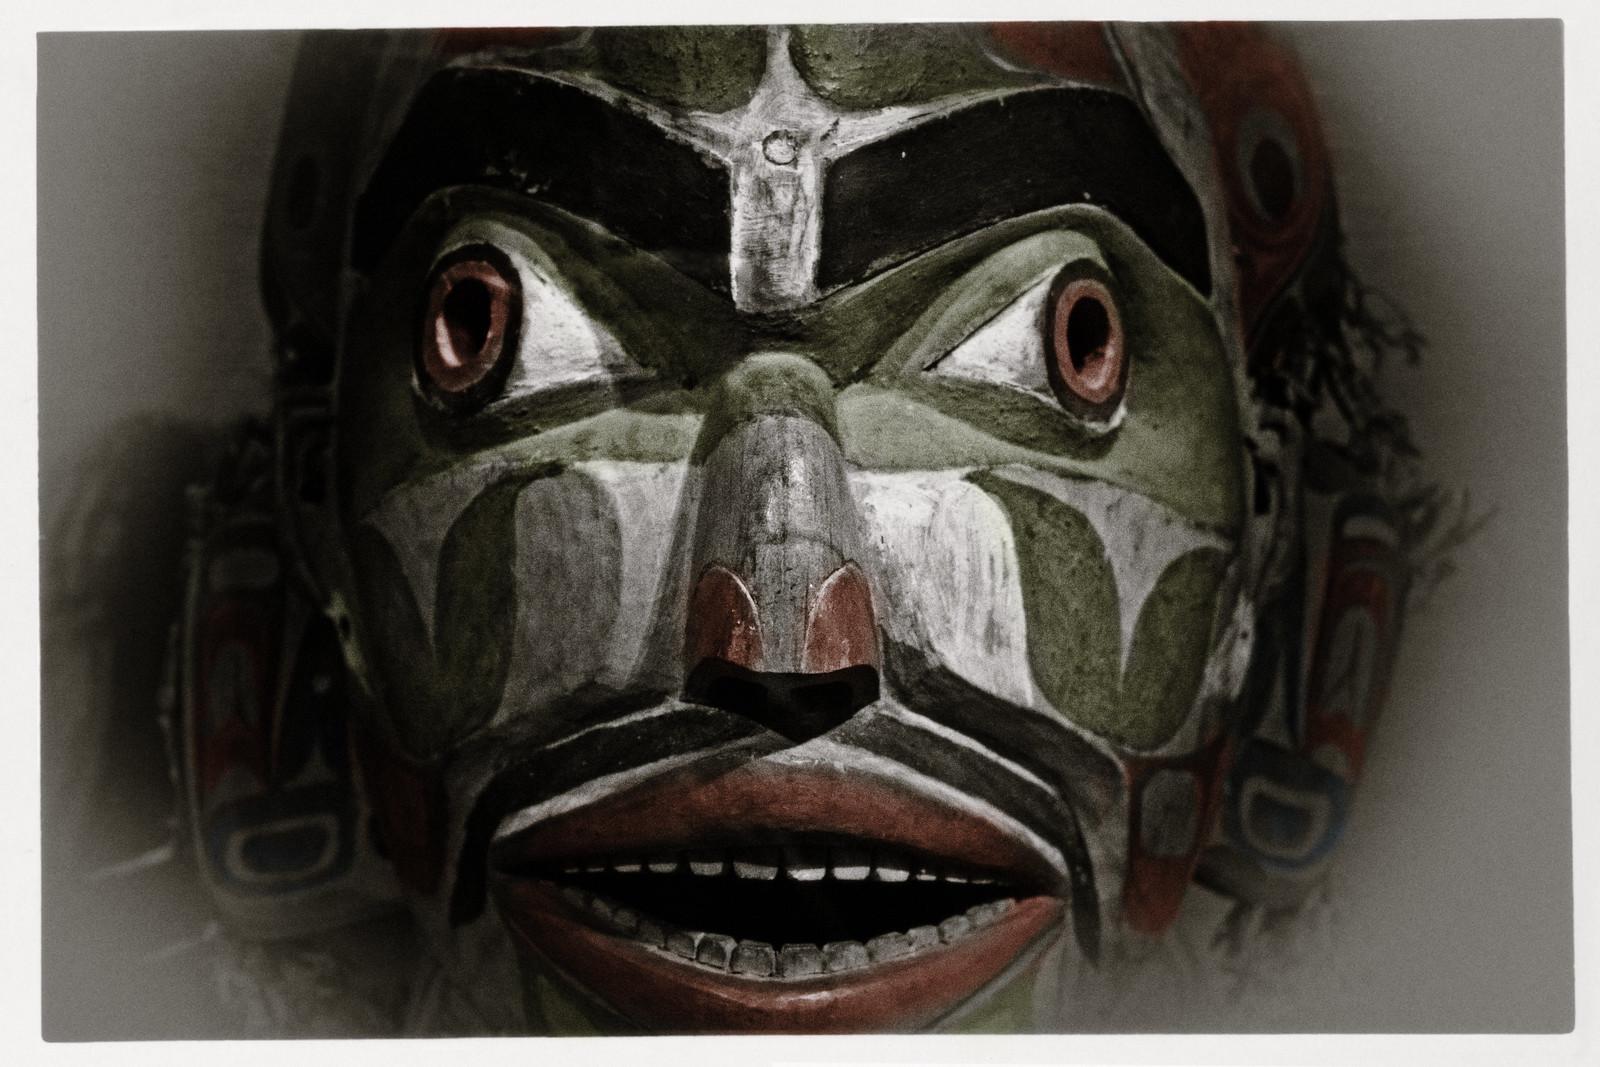 American Museum of Natural History - Kwakiutl Mask